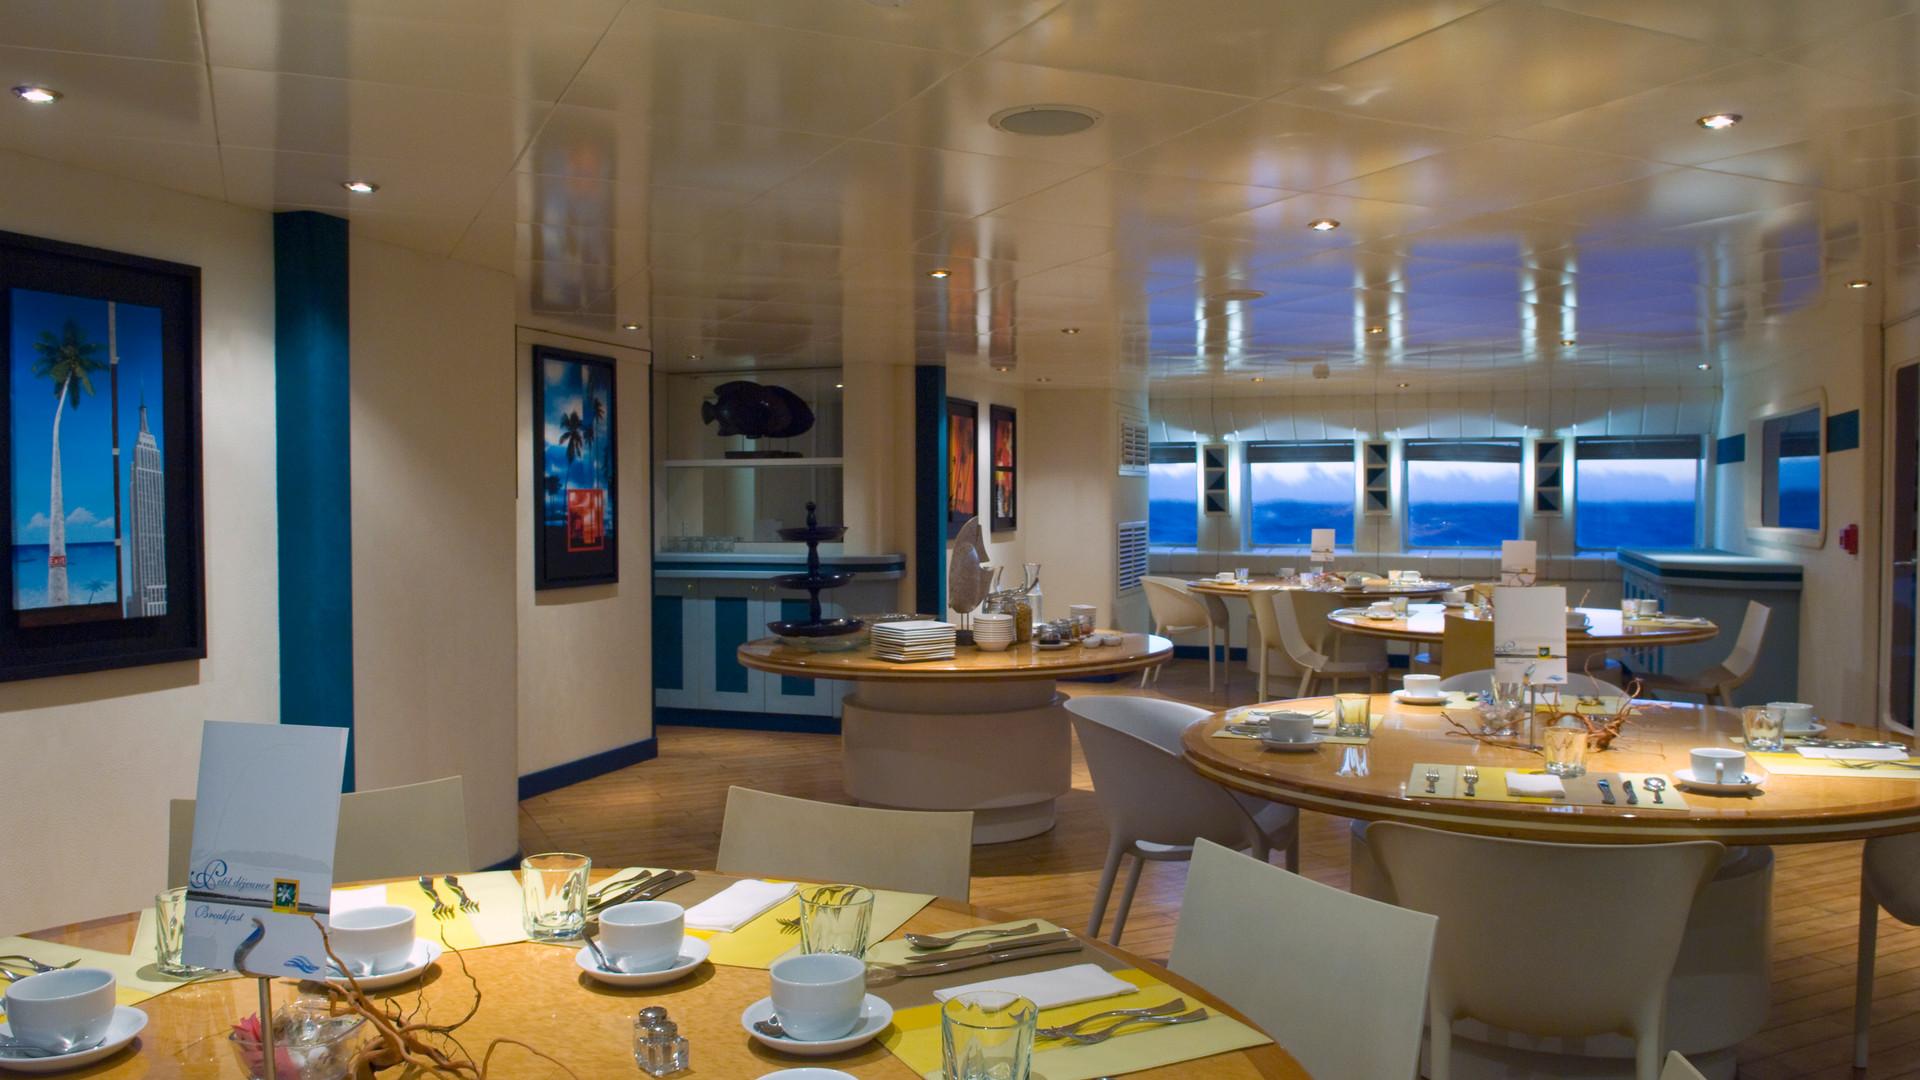 haumana_cruise-restaurant